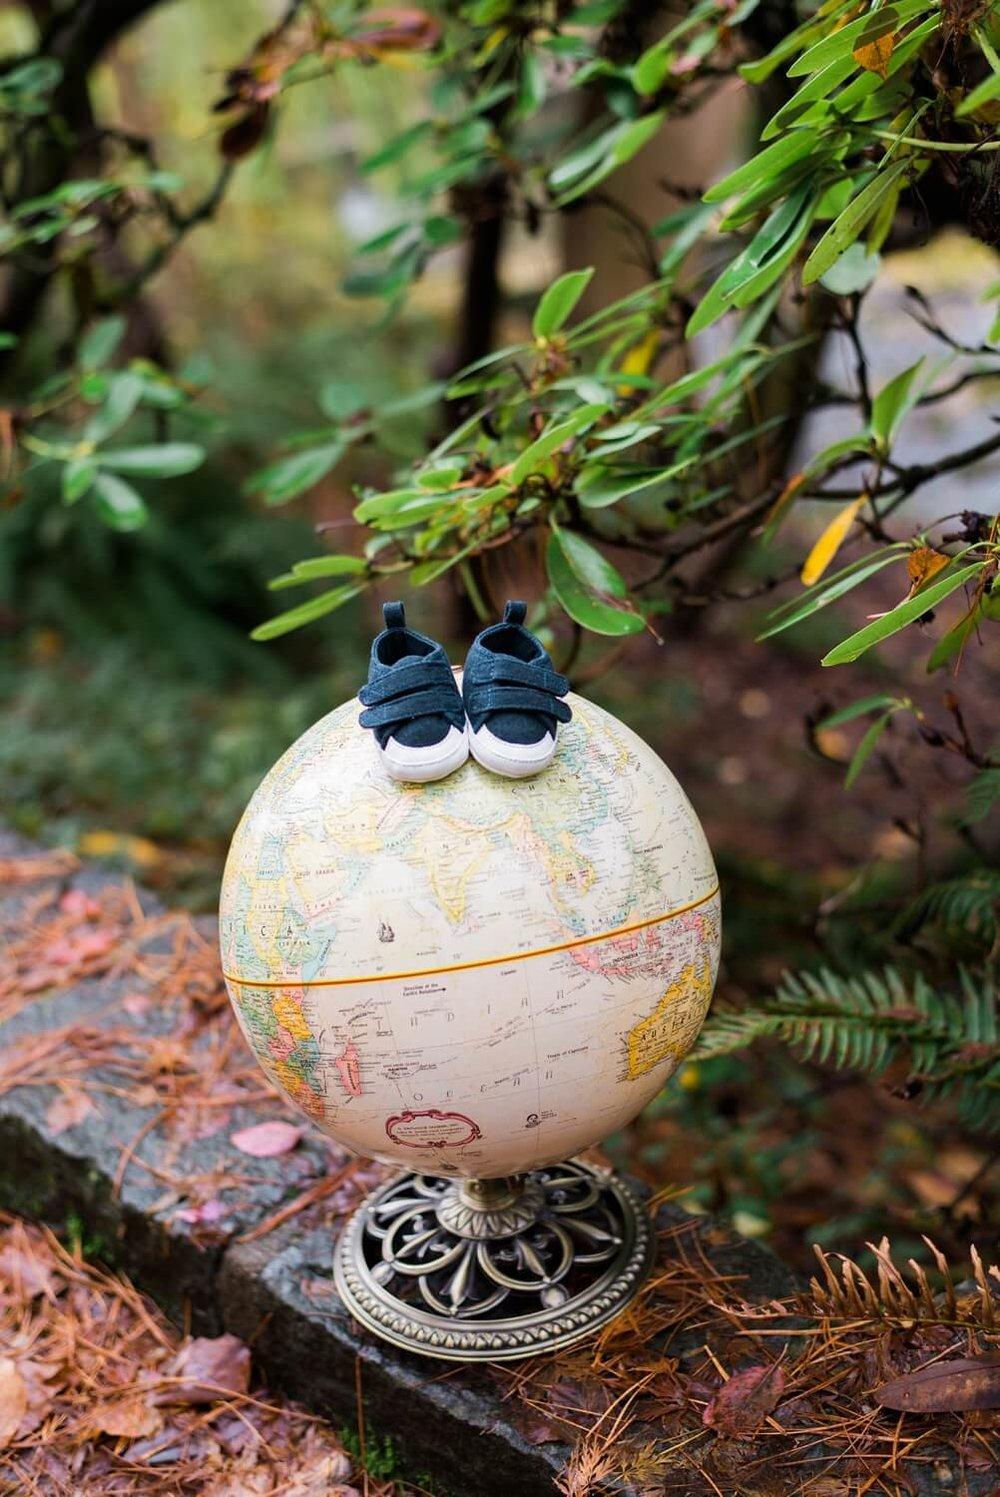 portland-maternity-crystal-springs-rhododendron-garden-oregon-shelley-marie-photo-075_cr.jpg